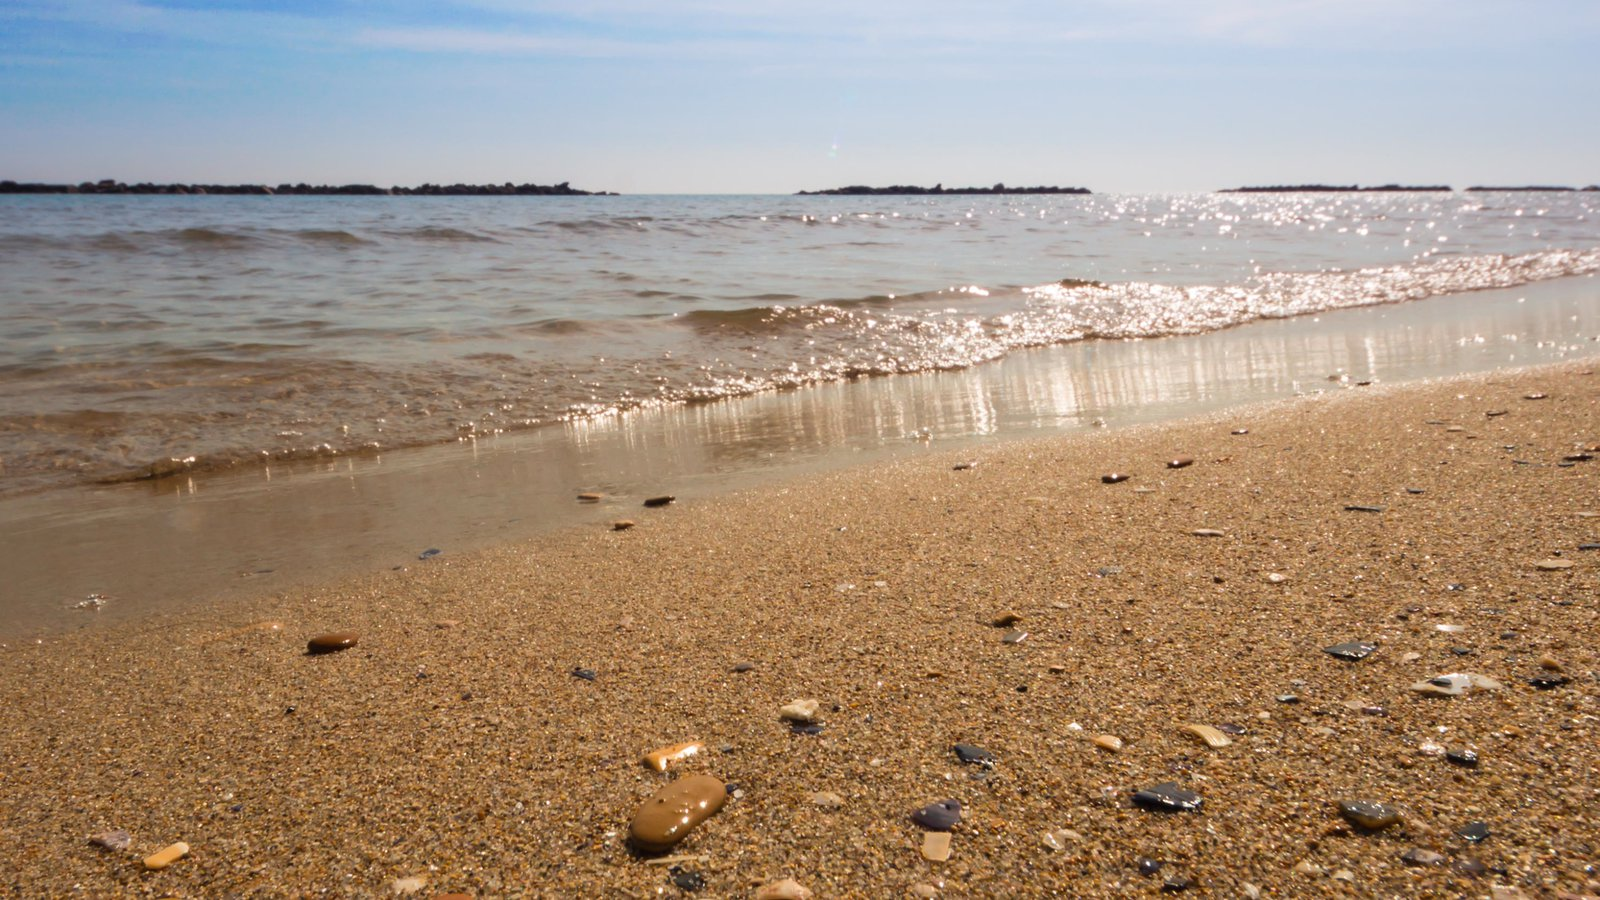 San Benedetto del Tronto showing a sandy beach